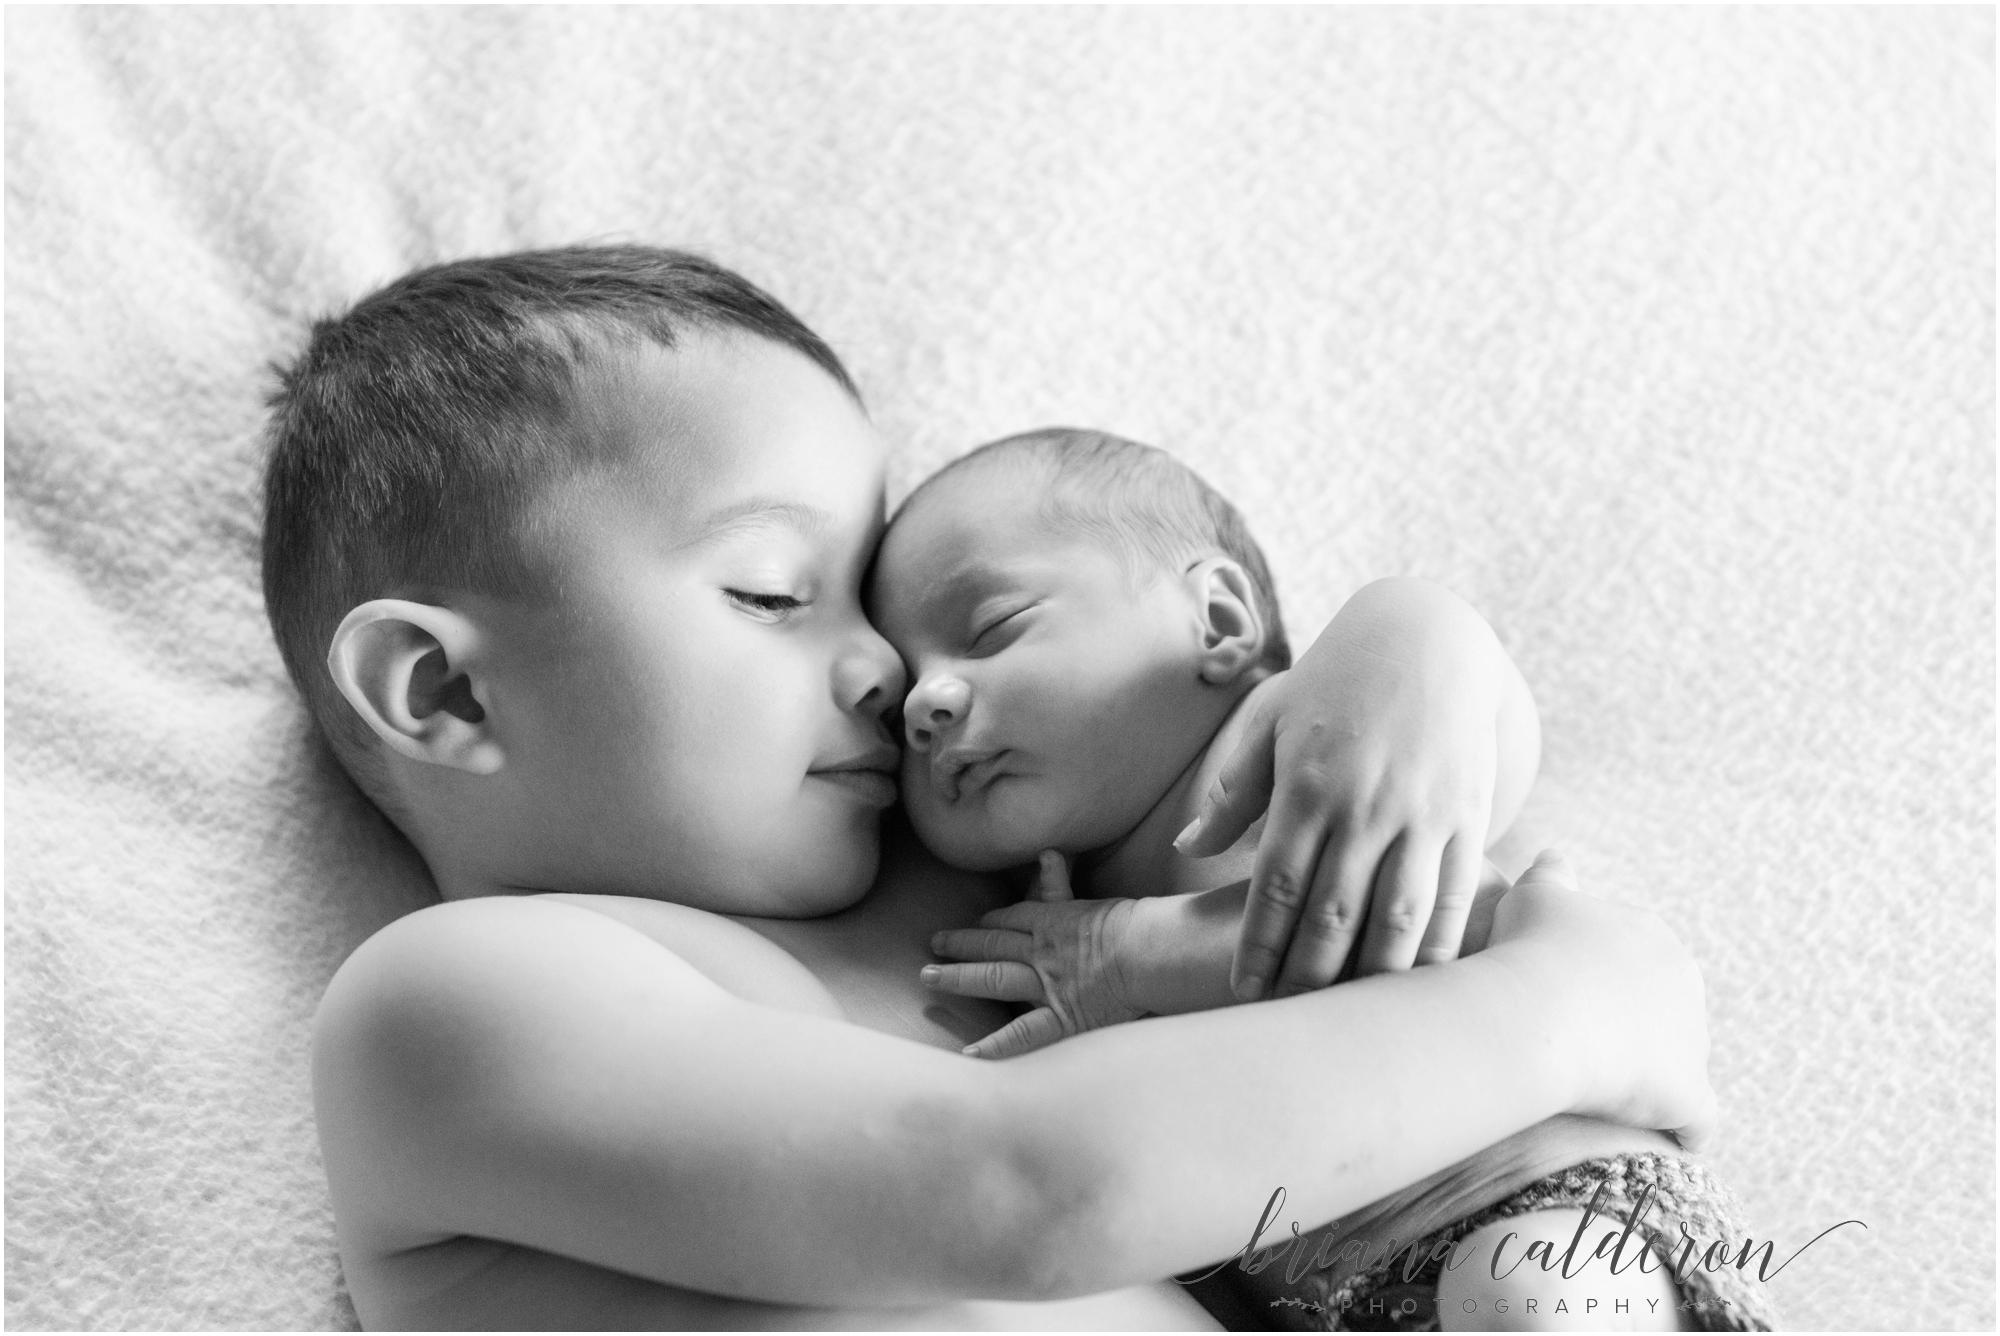 Bay Area lifestyle newbornpictures by Briana Calderon Photography_1391.jpg